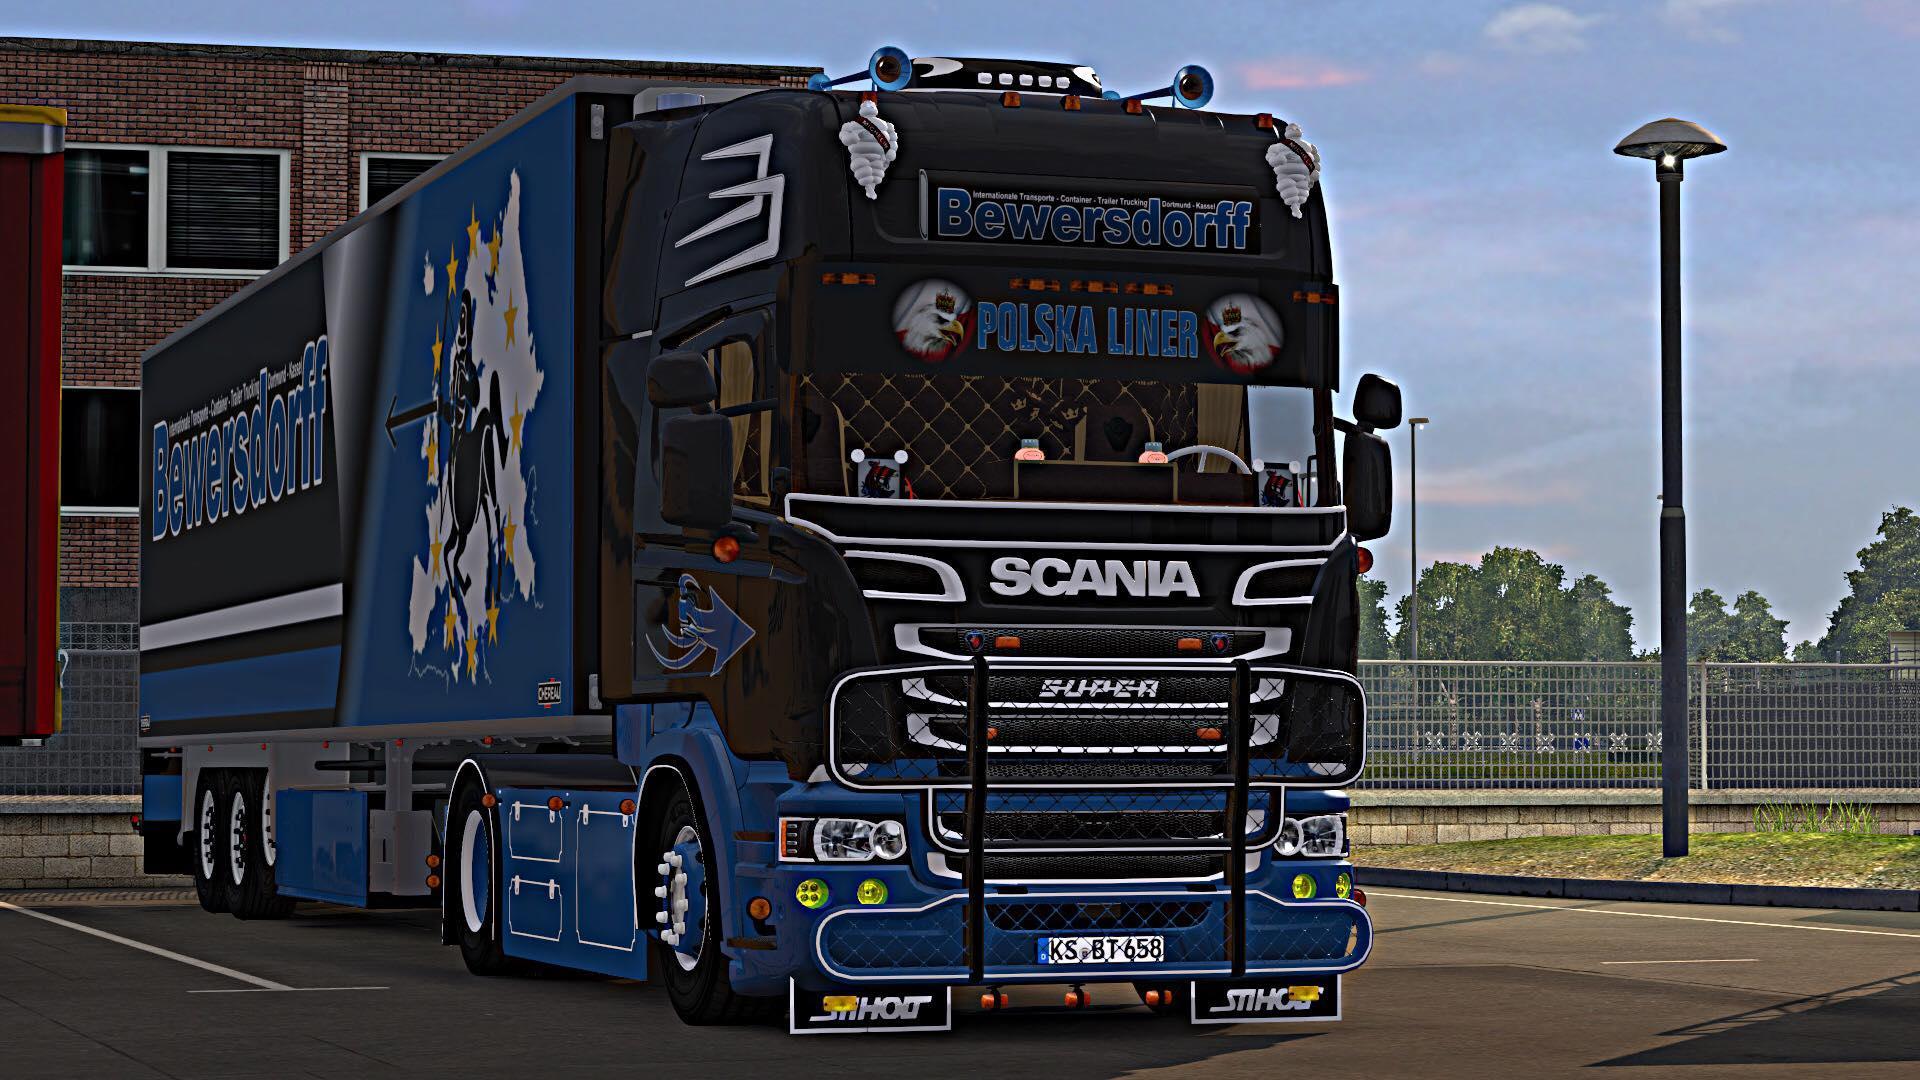 Scania Bewersdoof 1 30 Truck Mod Euro Truck Simulator 2 Mods